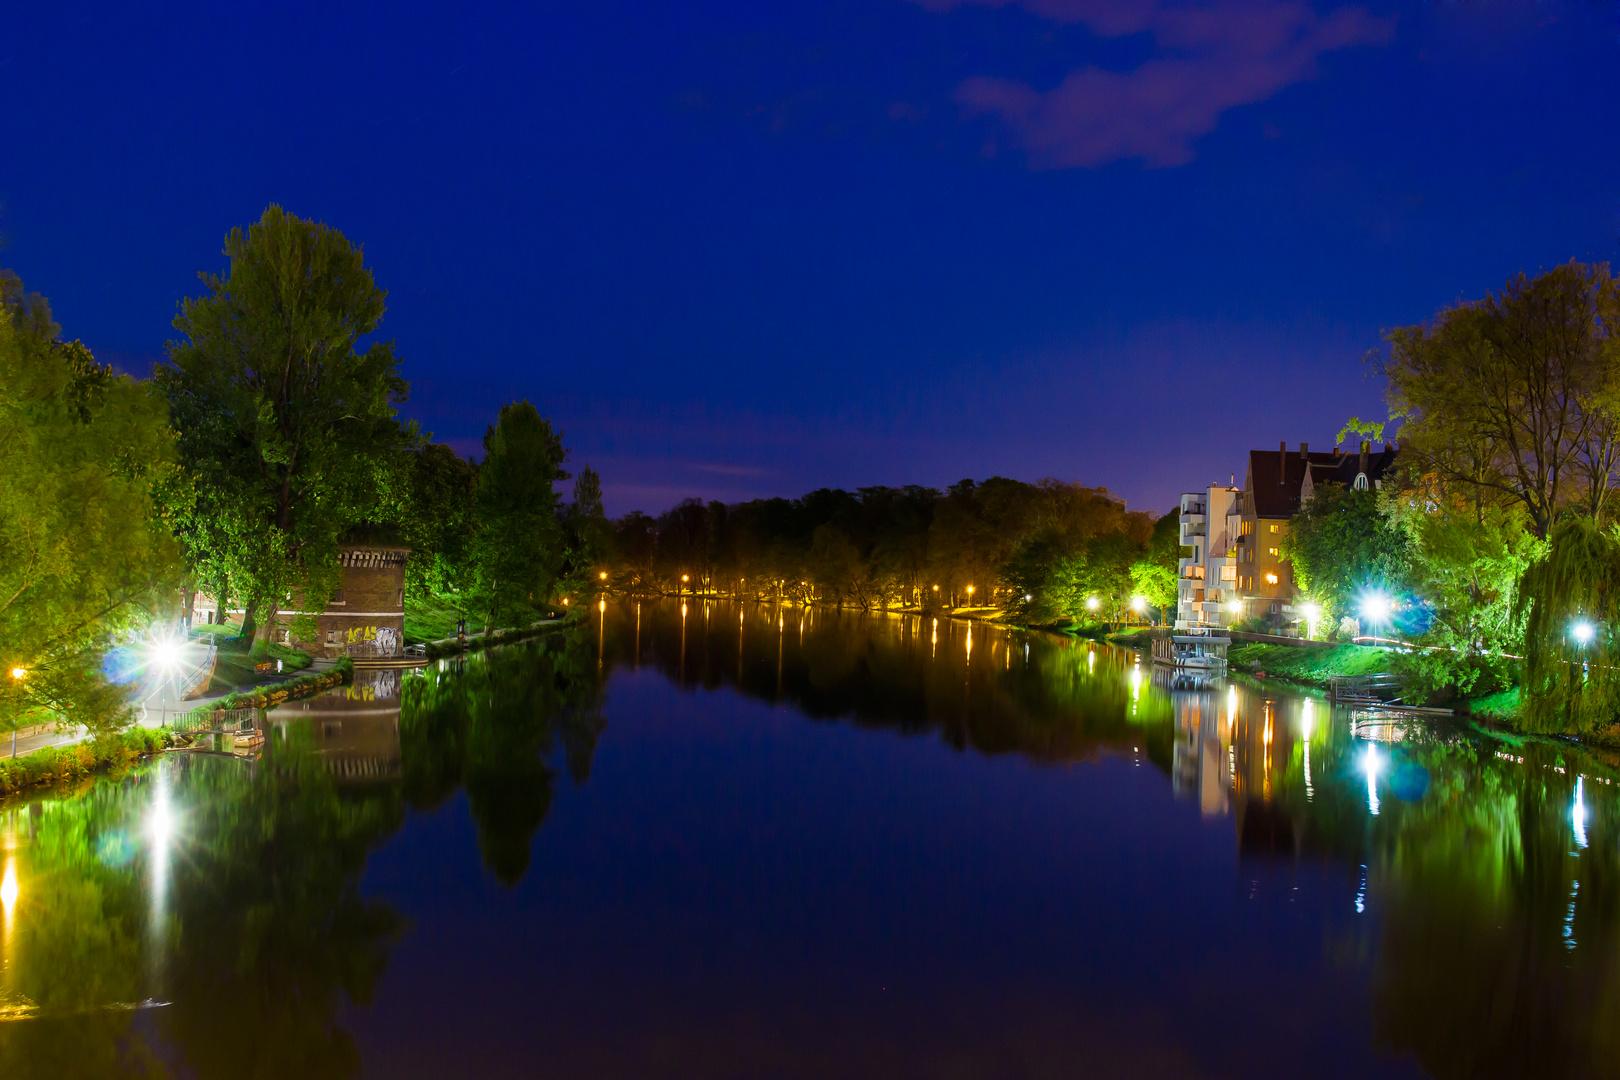 Donau in Ulm bei Nacht